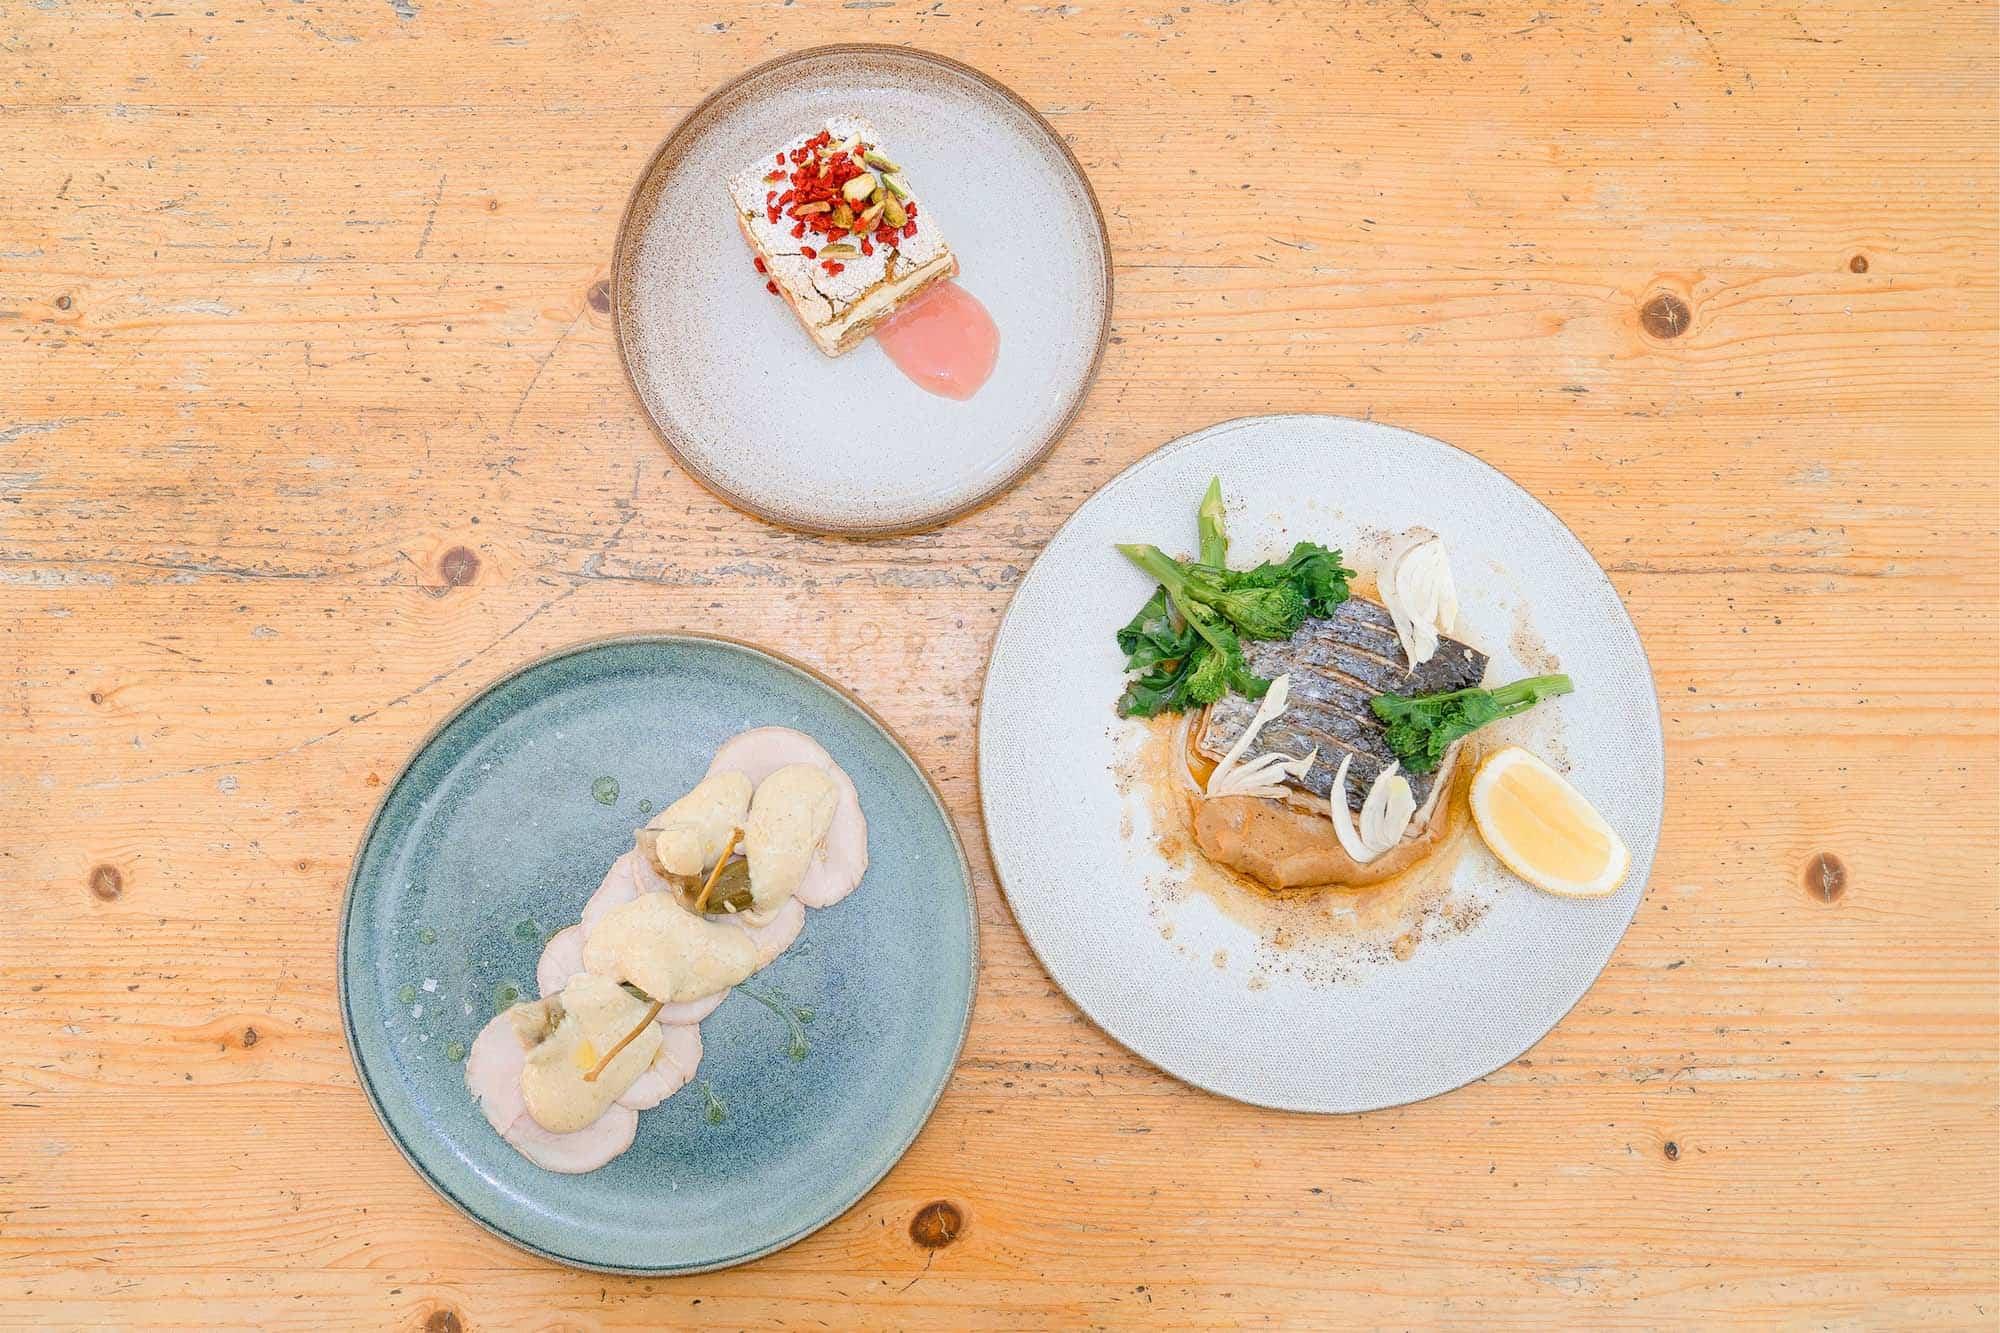 Finish & Feast DIY Meal Kits